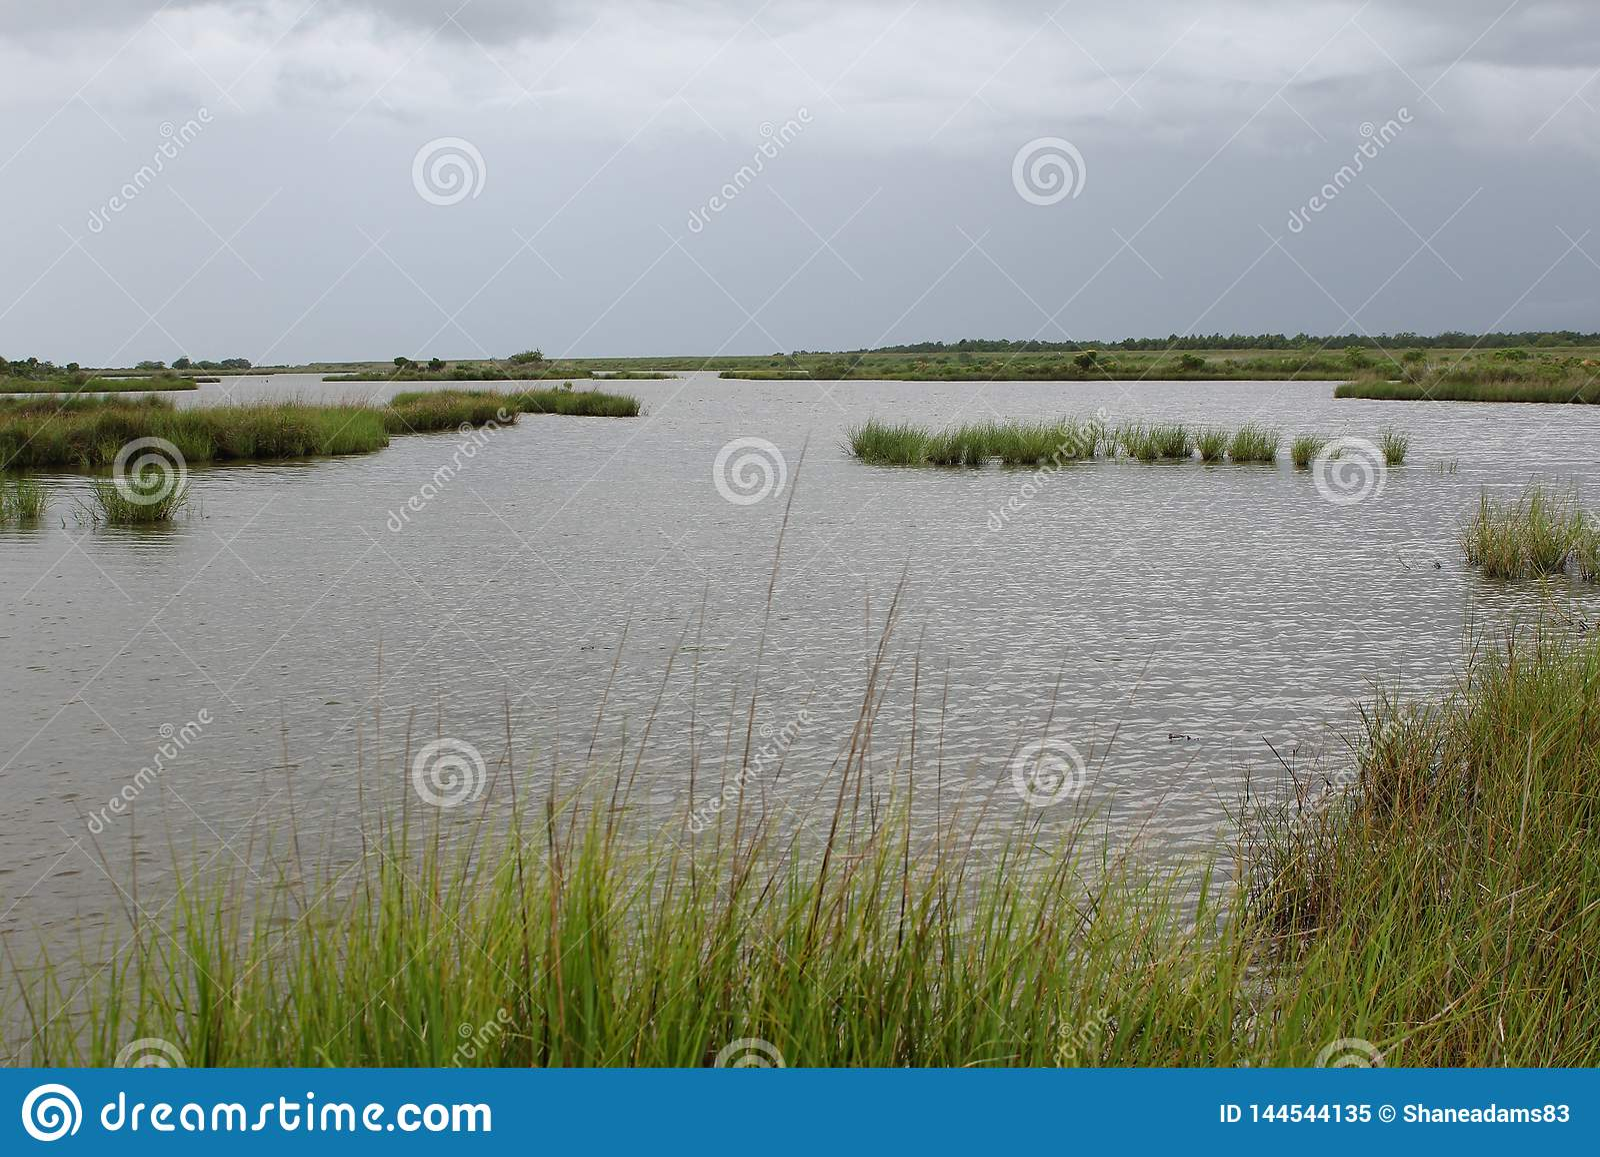 Louisiana Marsh Grass